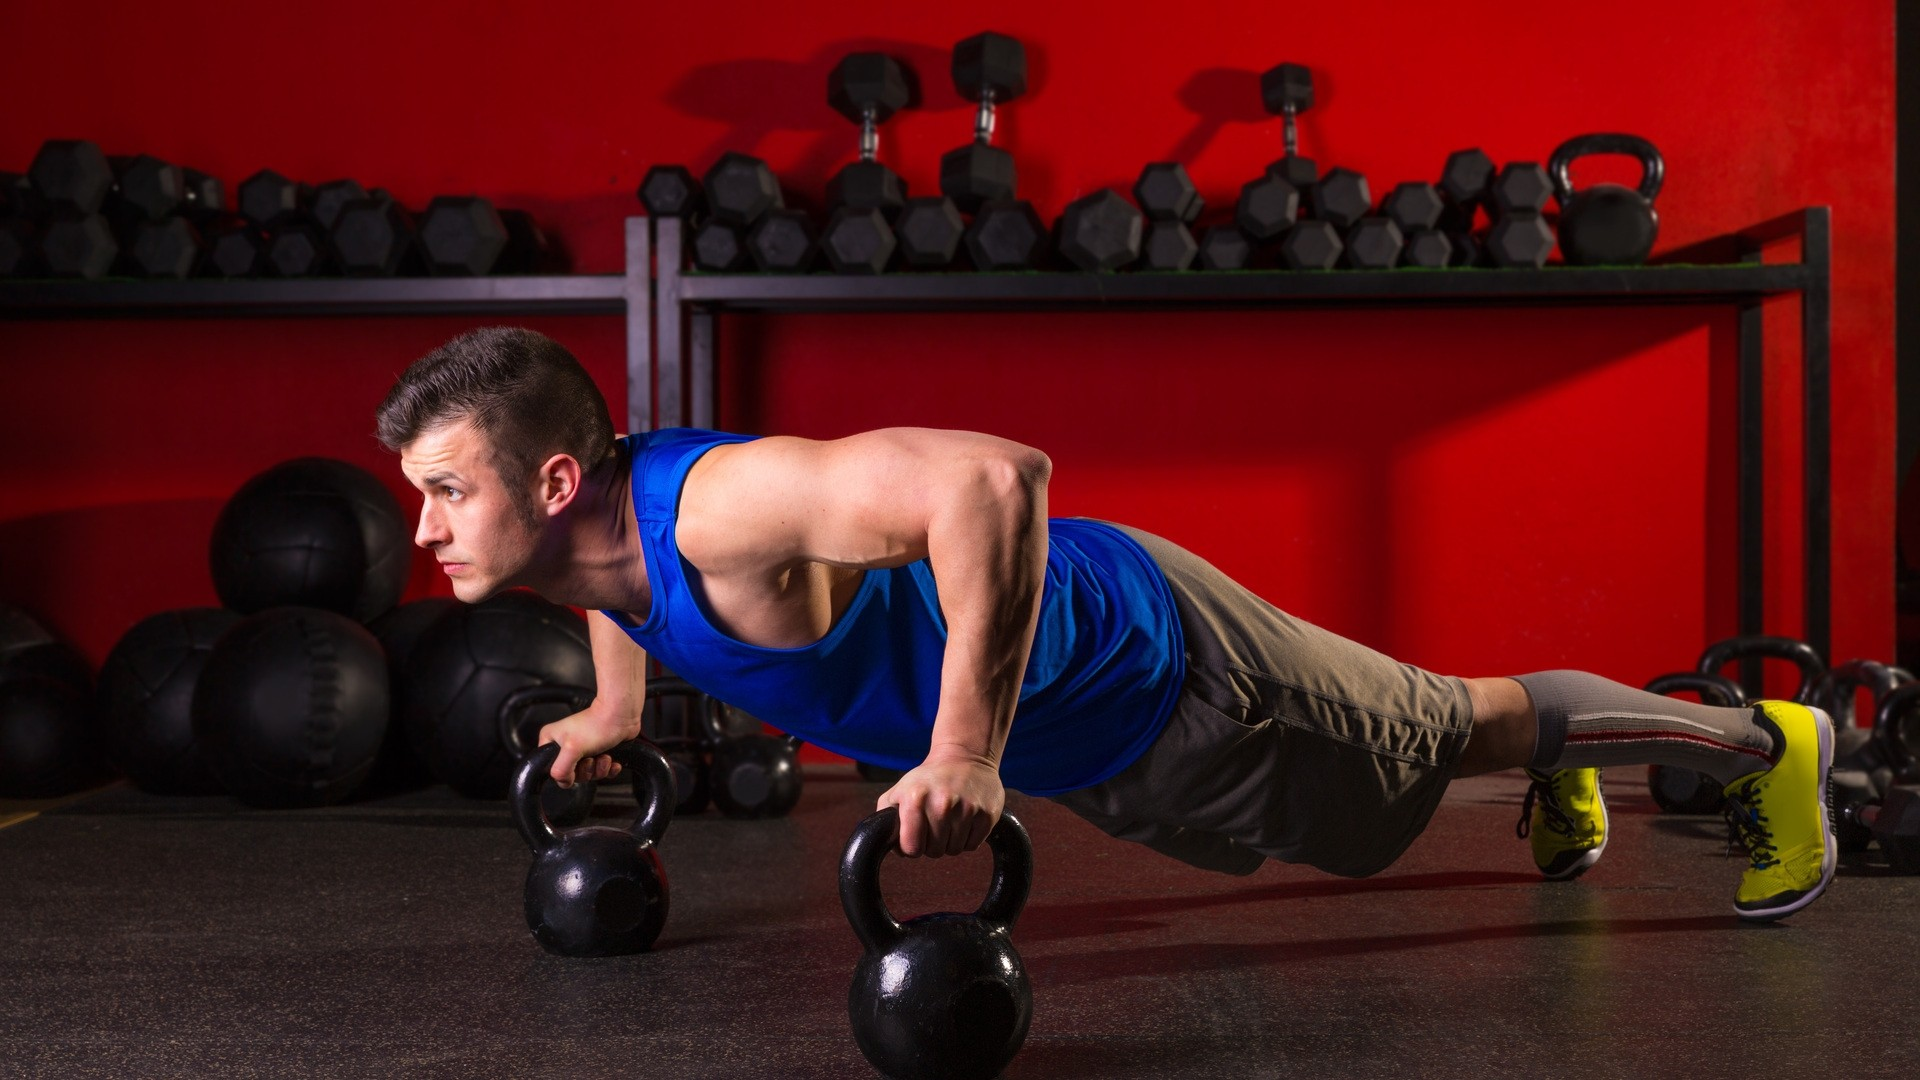 Fitness Download Wallpaper